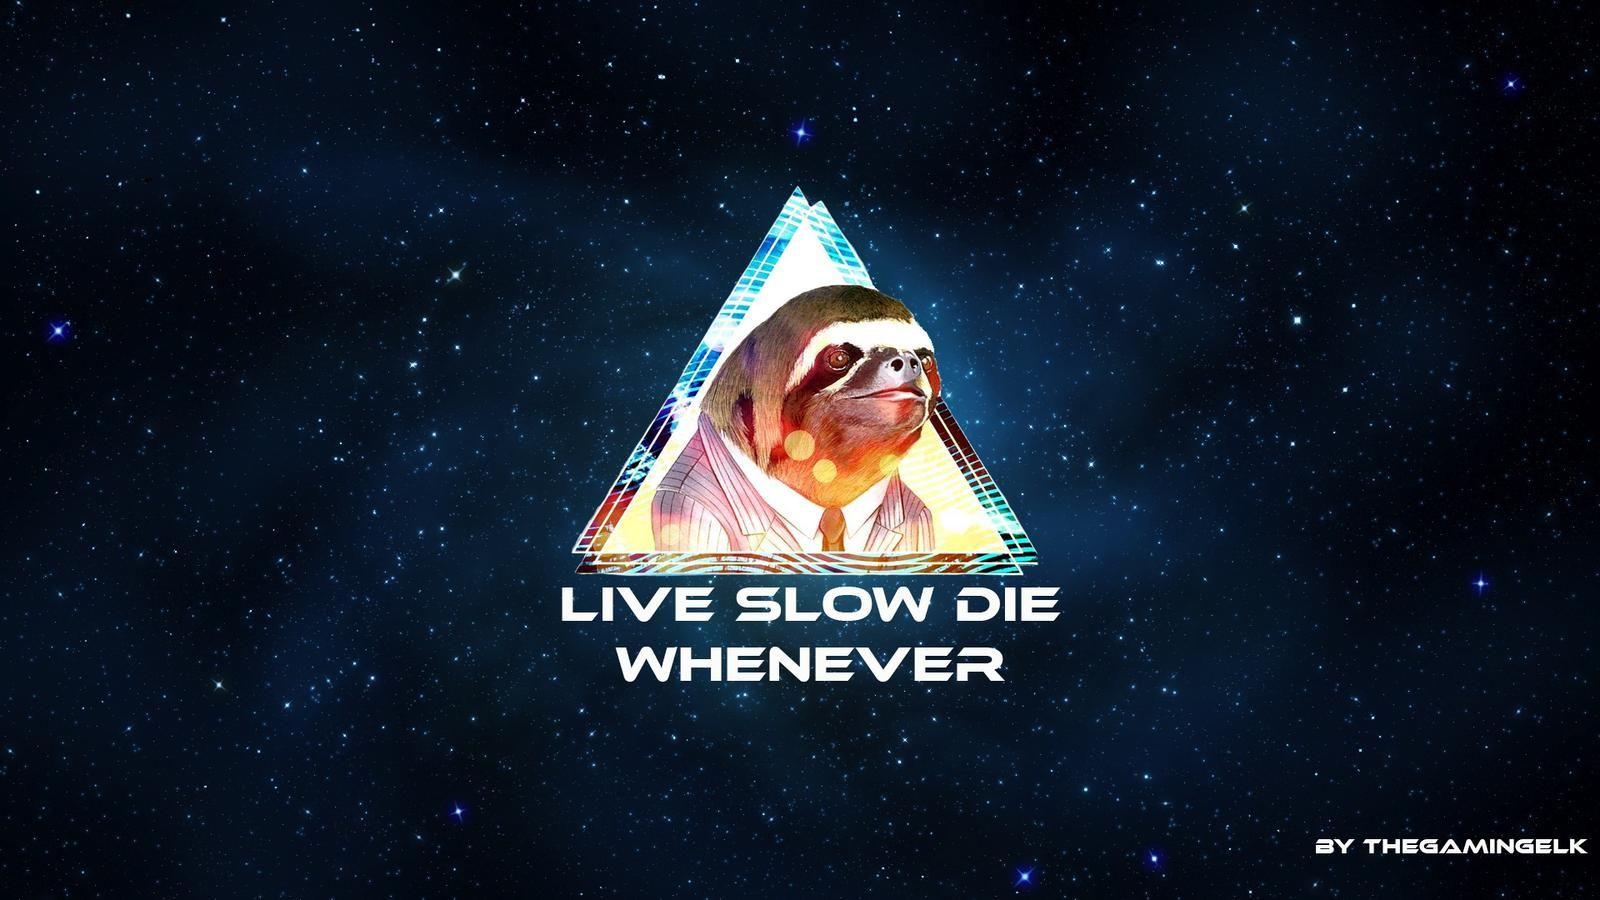 Sloth Hd Wallpaper Windows By Thegamingelk On Deviantart Live